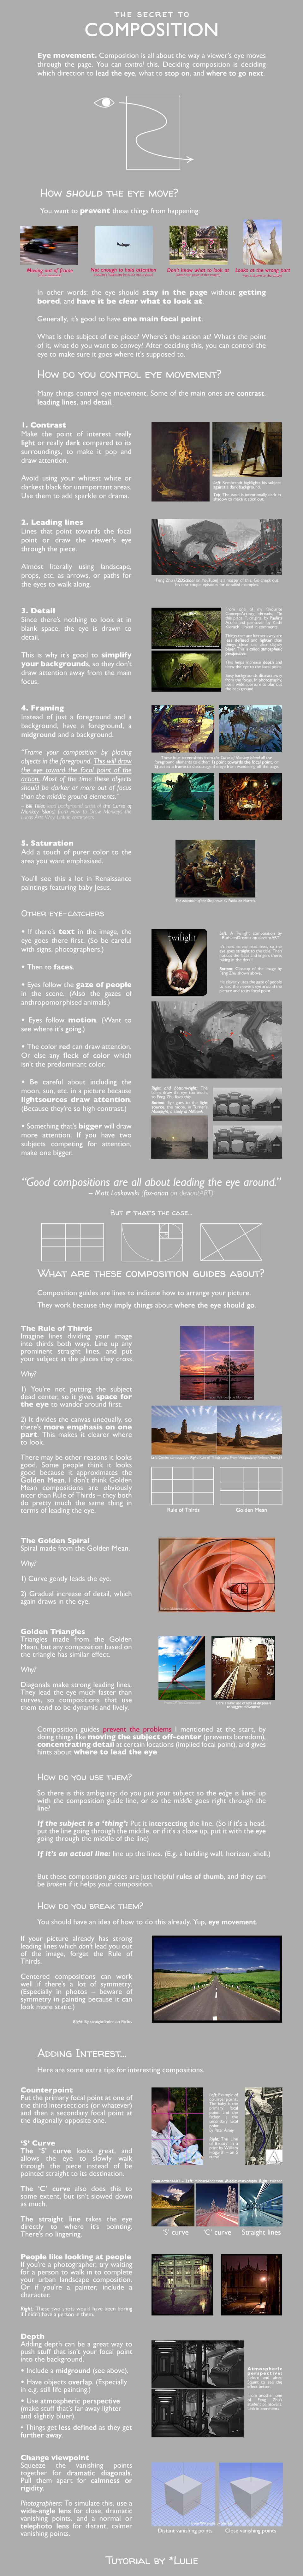 The Secret to Composition